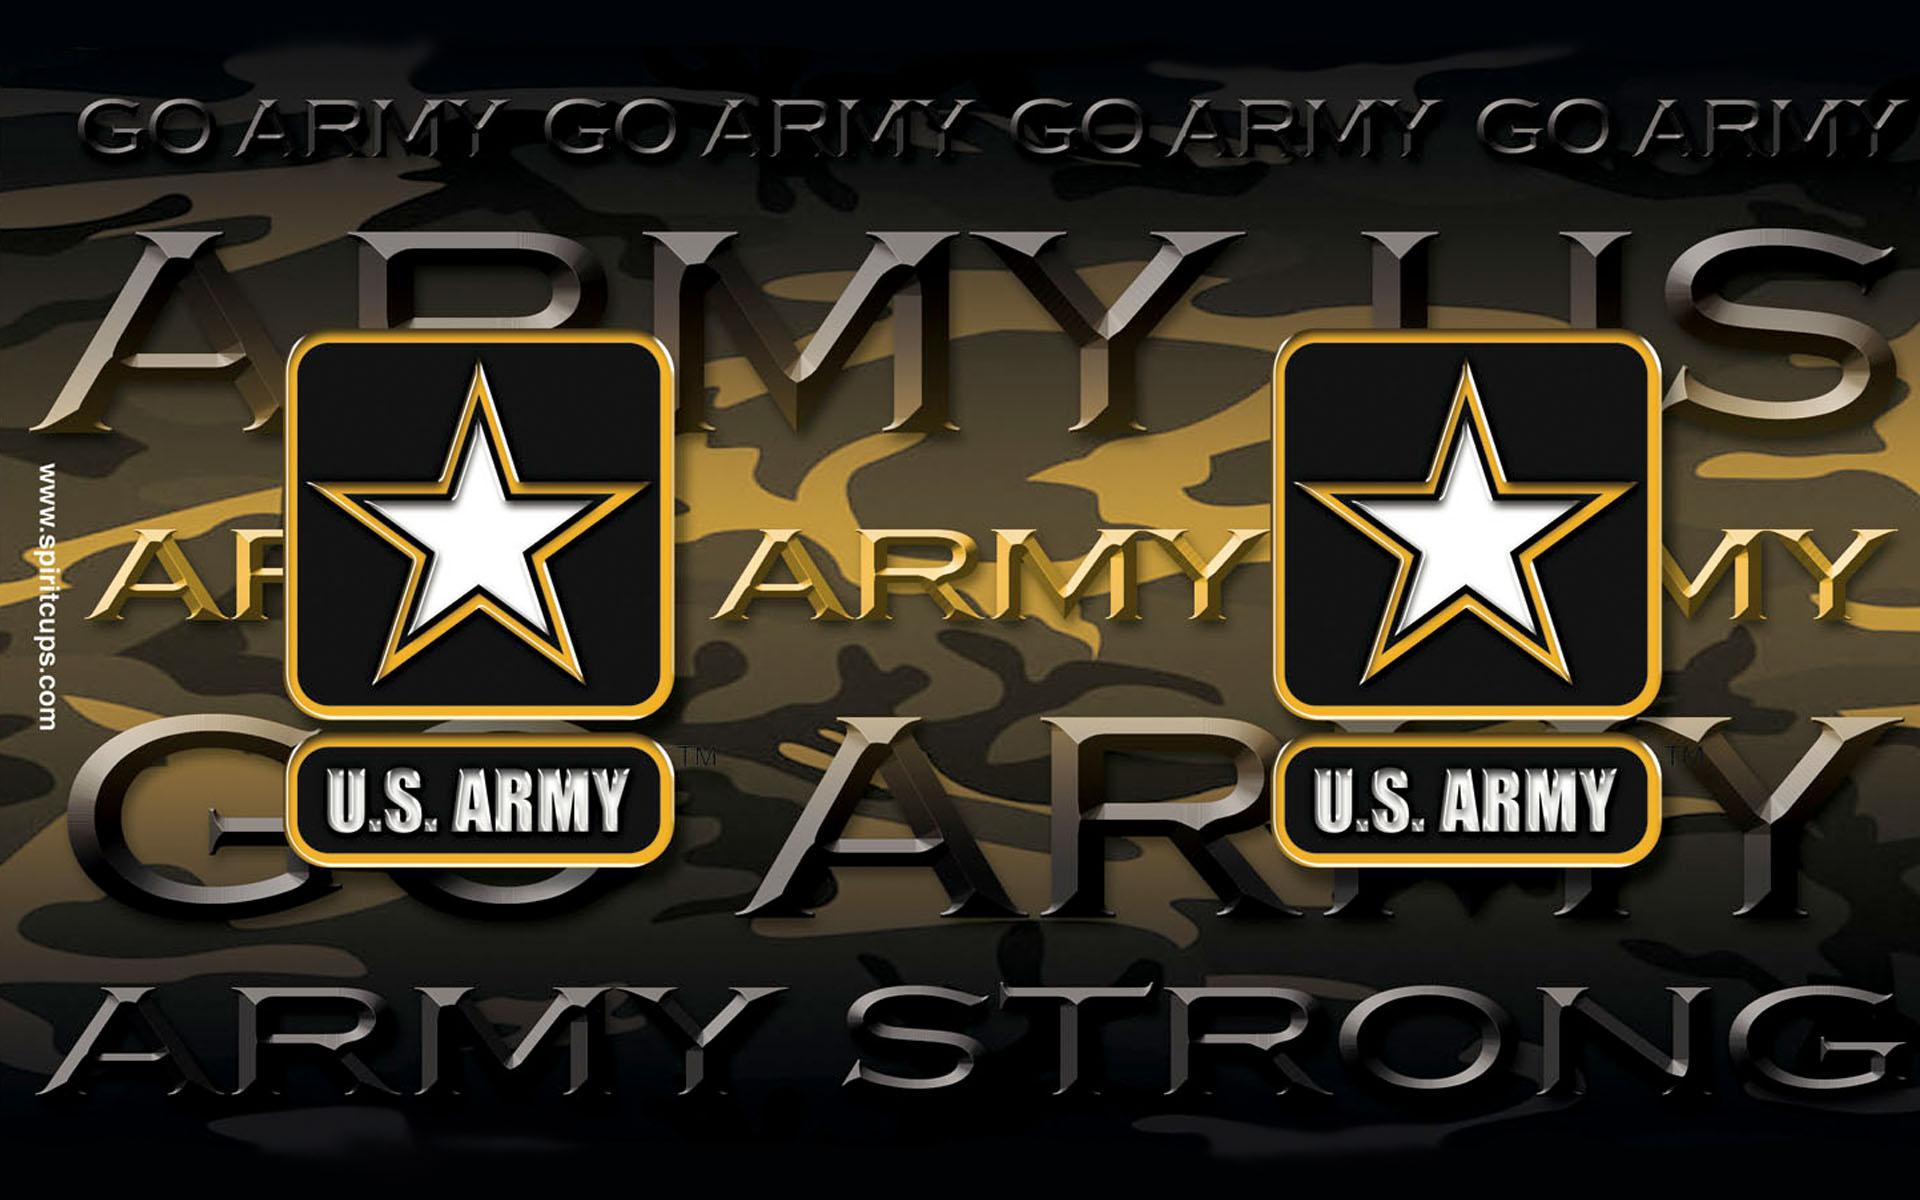 US Army Desktop Backgrounds Desktop Image 1920x1200